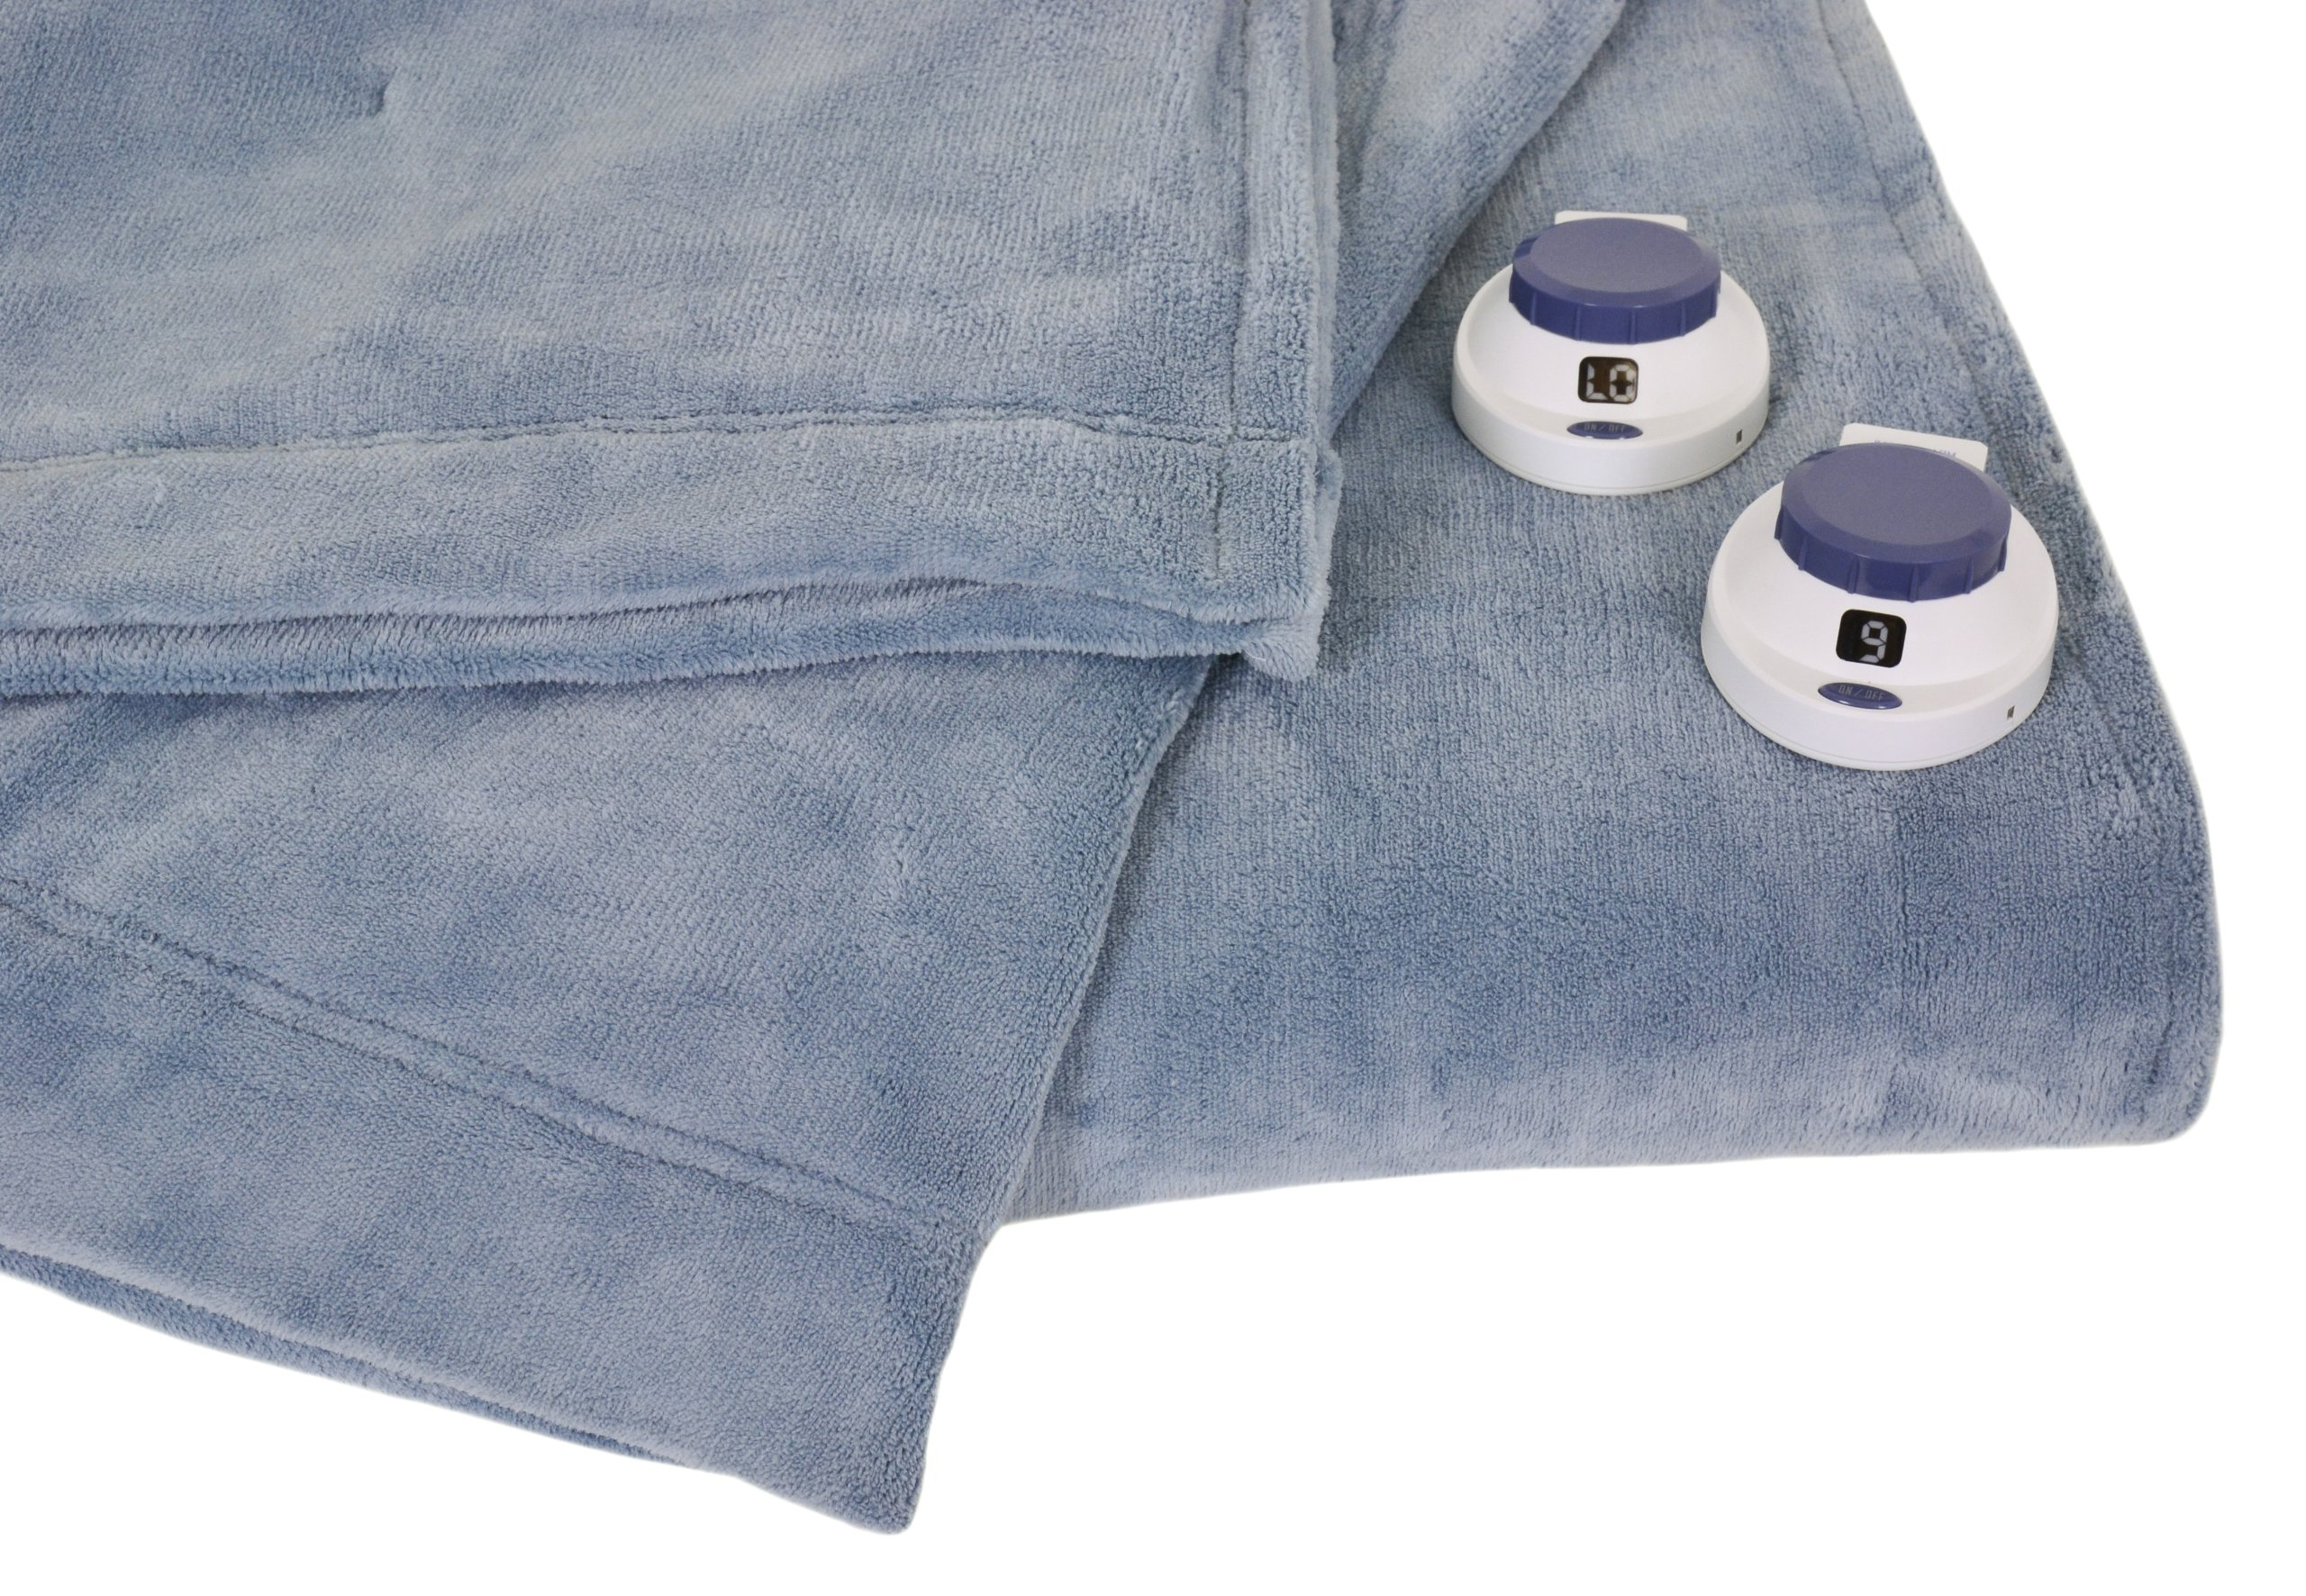 Serta Luxe Plush Low-Voltage Electric Heated Micro-Fleece Blanket, King, Sapphire